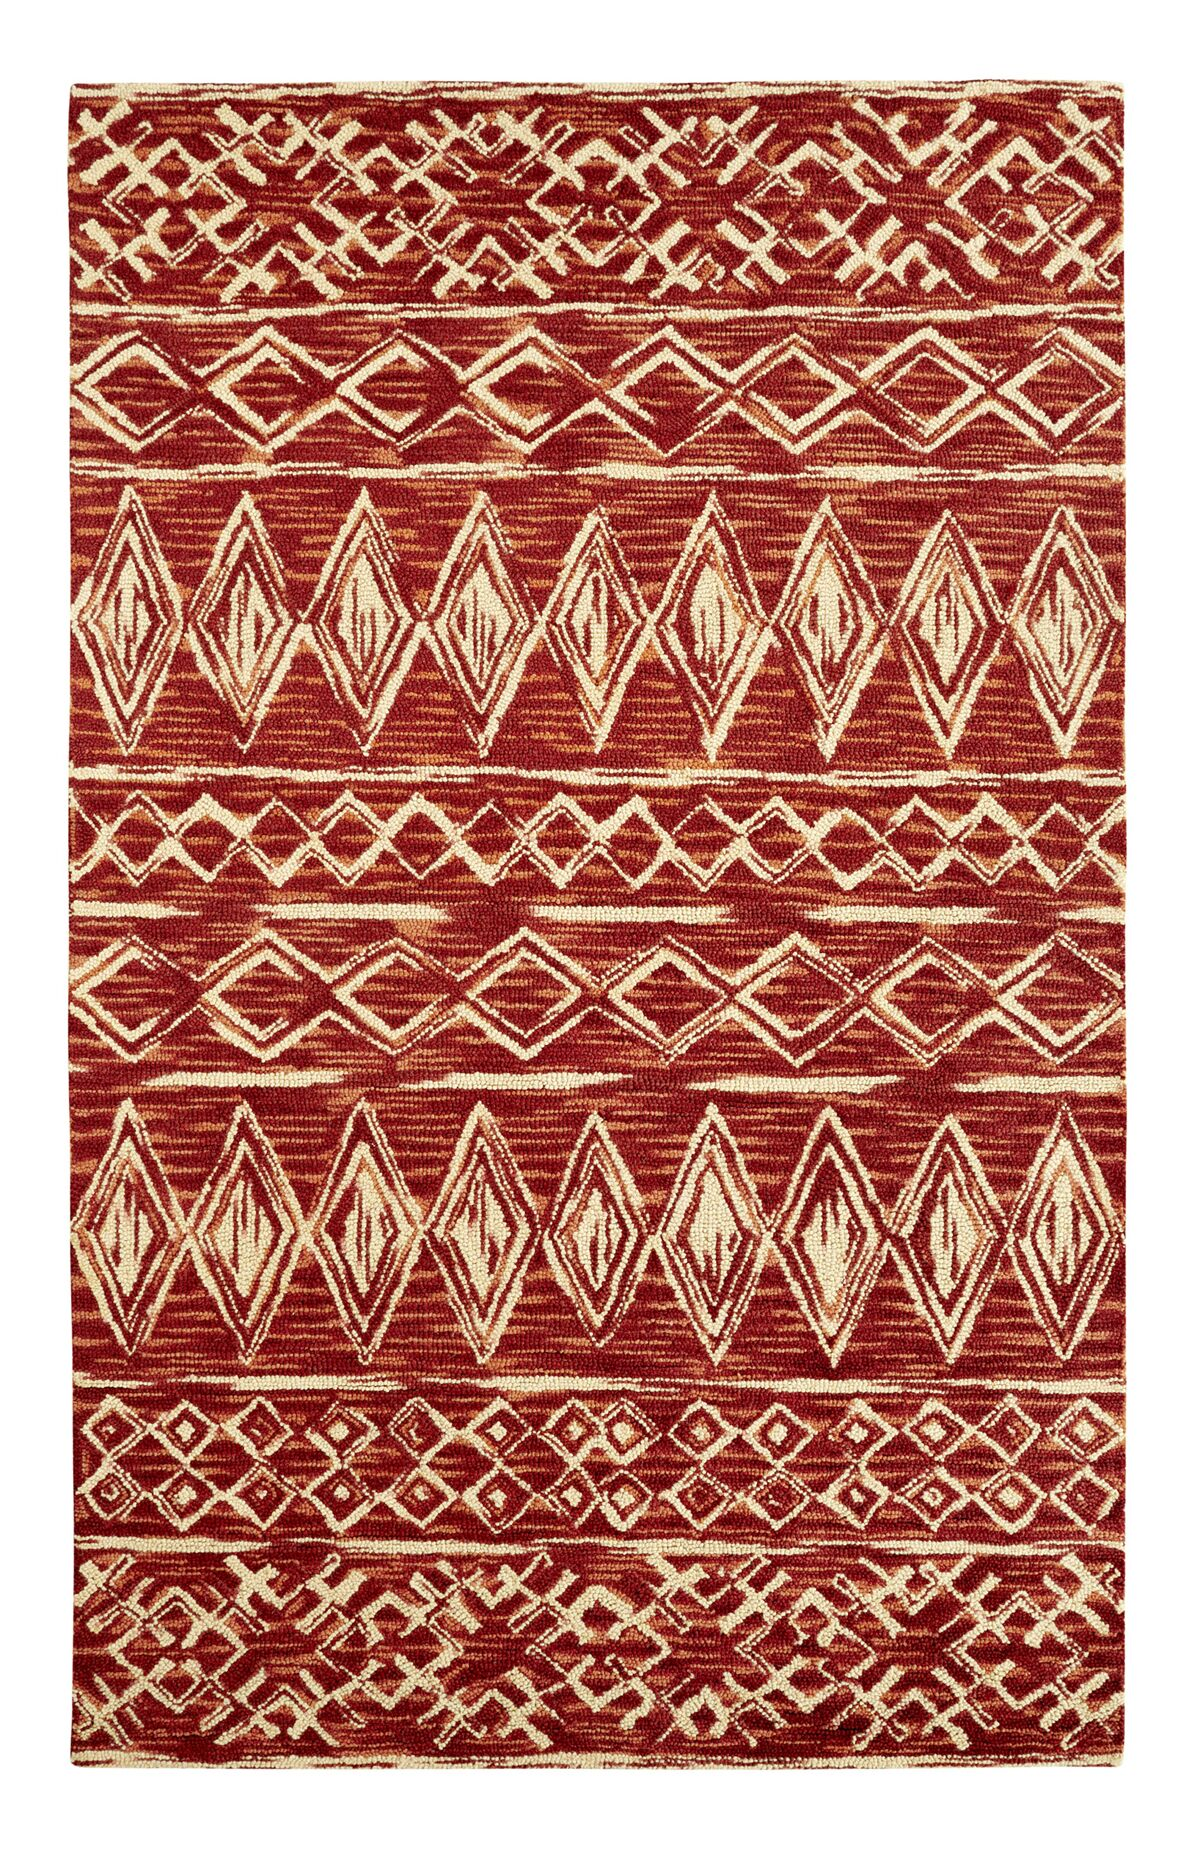 Dream Handwoven Flatweave Wool Rust Area Rug Rug Size: Rectangle 8' x 11'